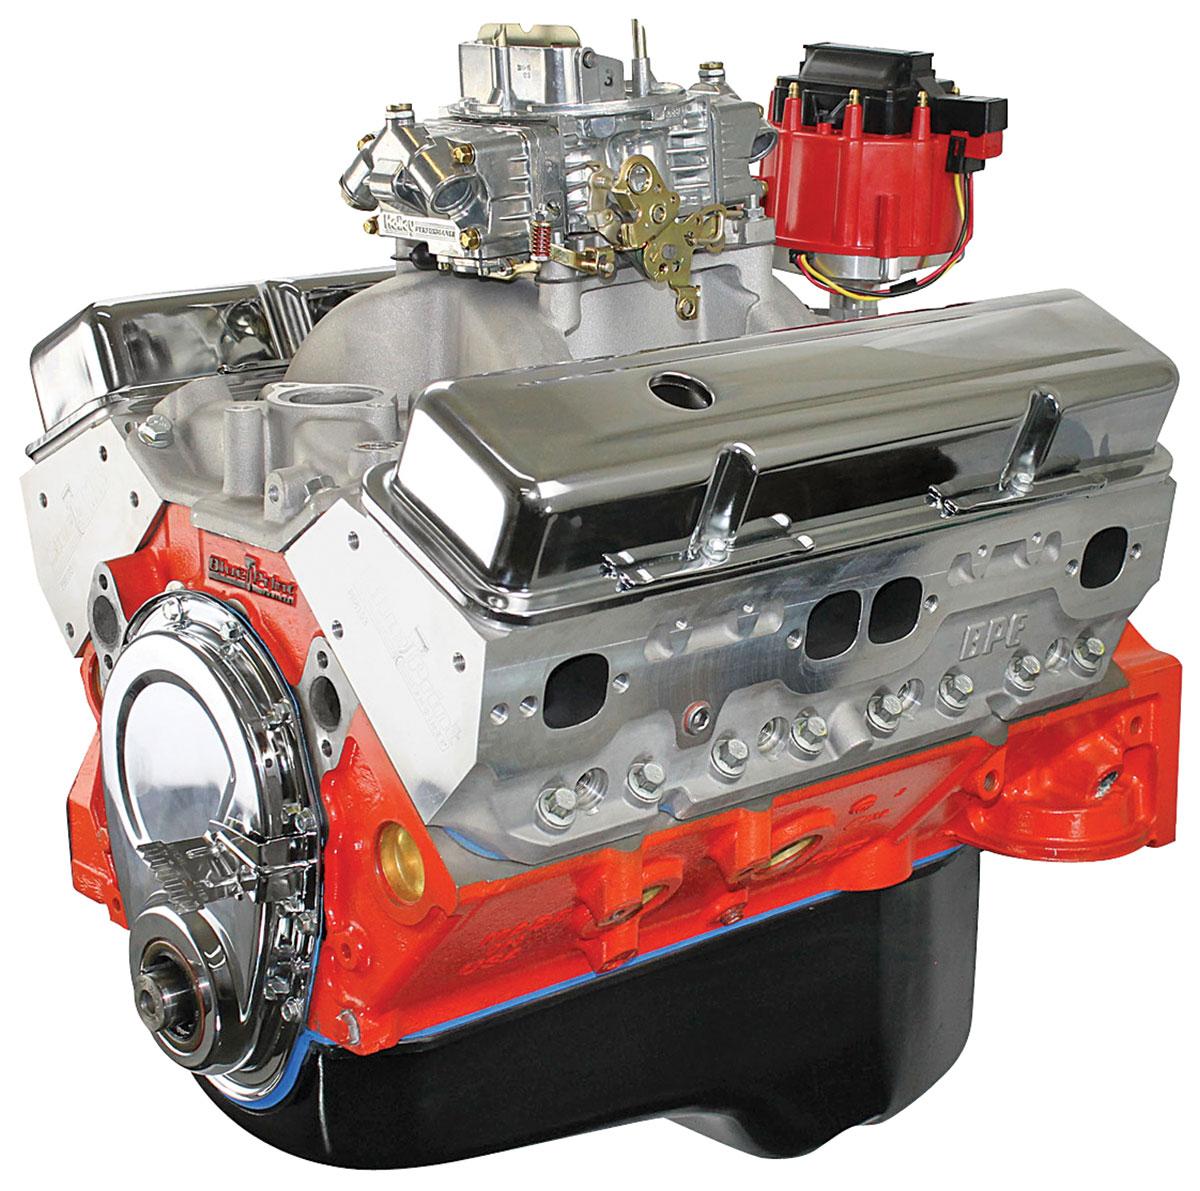 Blueprint engines 1964 77 chevelle crate engine base dressed 400 opgi 1964 77 chevelle crate engine base dressed 400 click to enlarge malvernweather Images